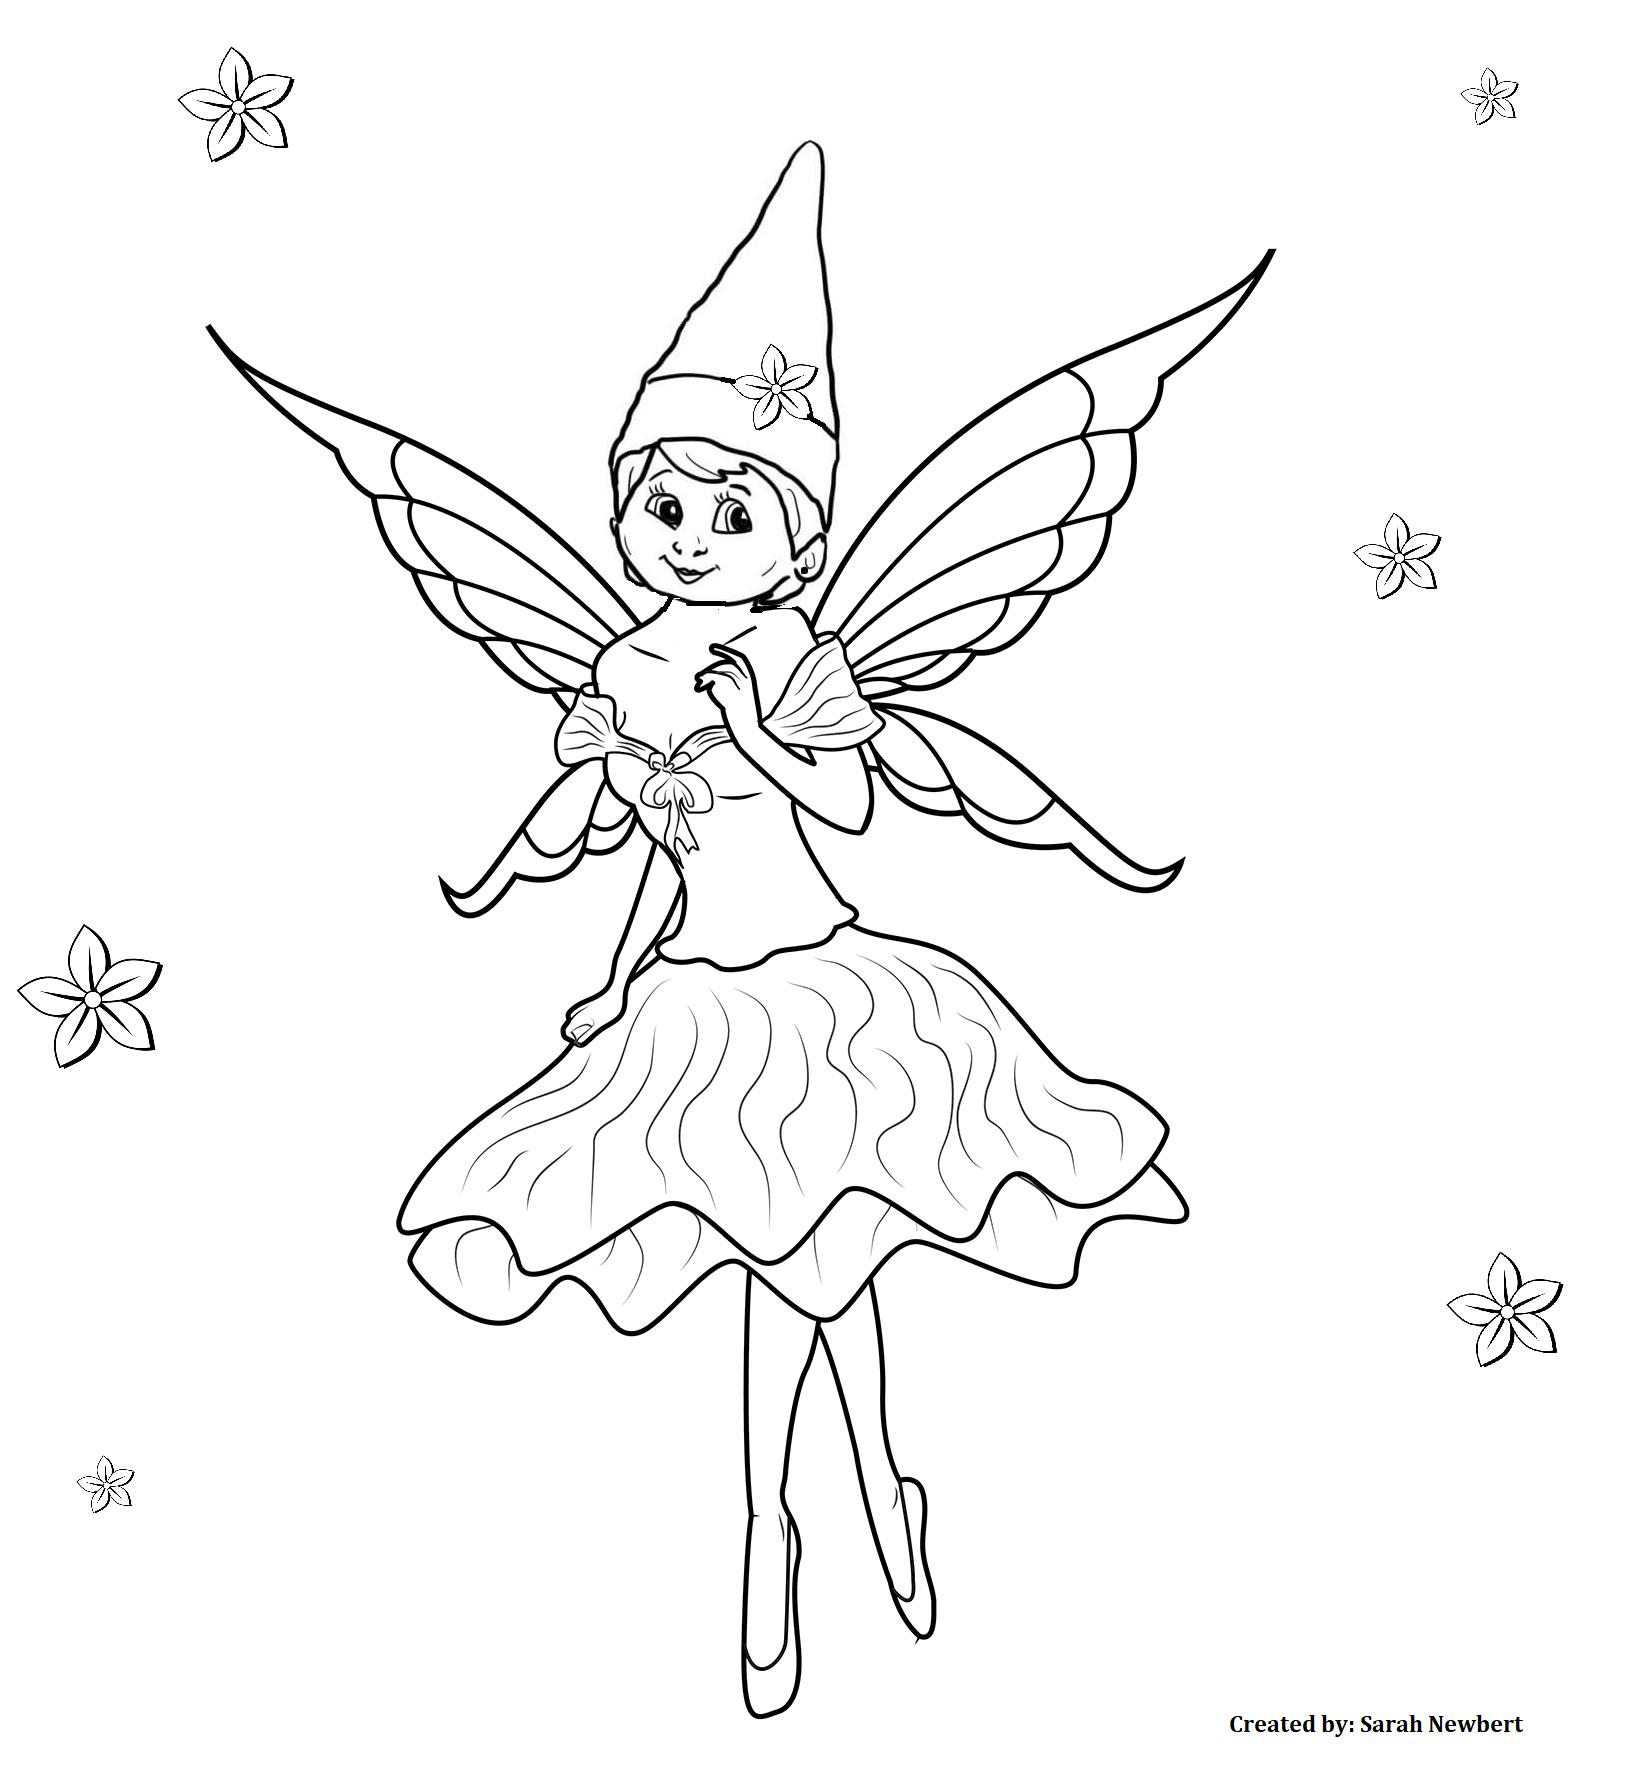 7adb236e5c7d56d9350012ba80ab1150 » Elf On The Shelf Coloring Anime